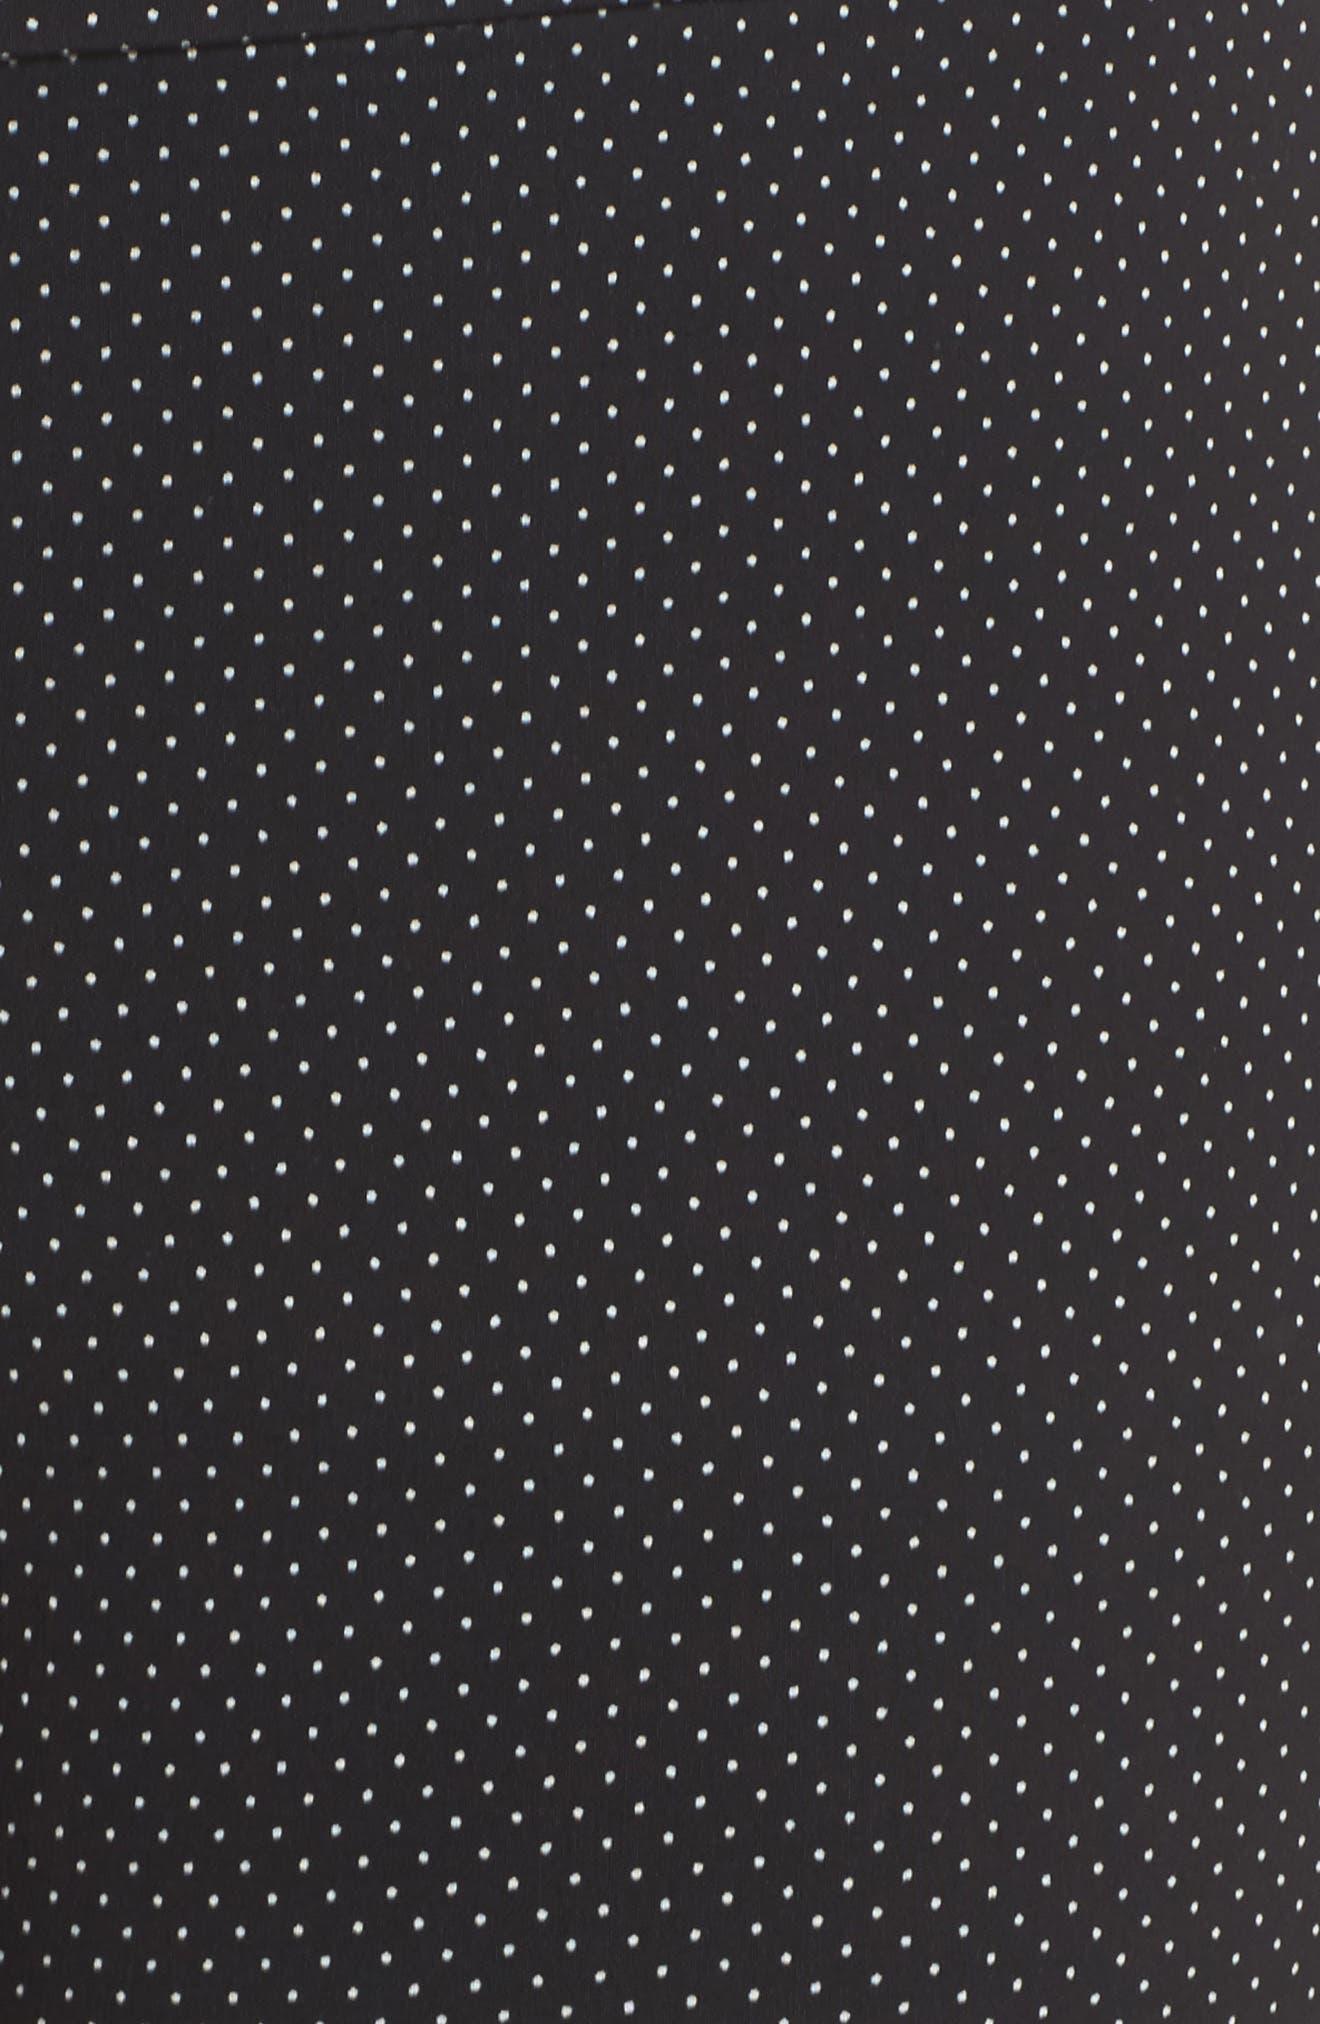 Polka Dot Crop Pants,                             Alternate thumbnail 5, color,                             Black- Ivory Dot